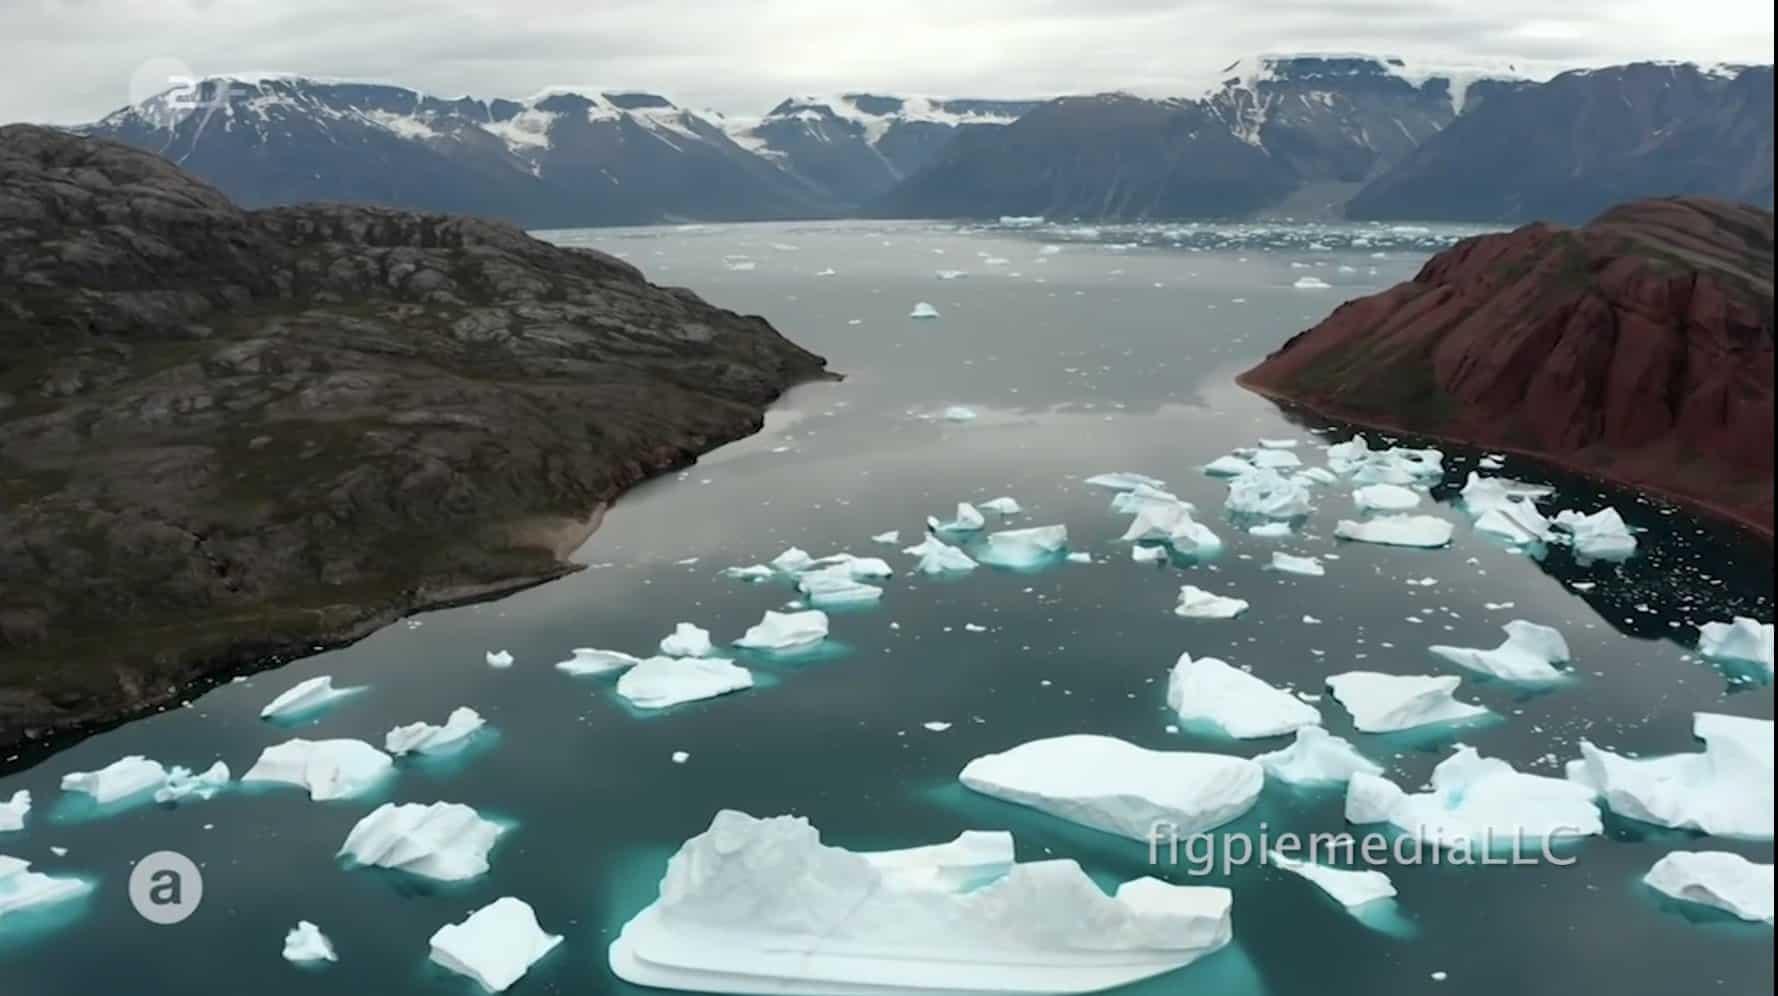 artic ocean with icebergs